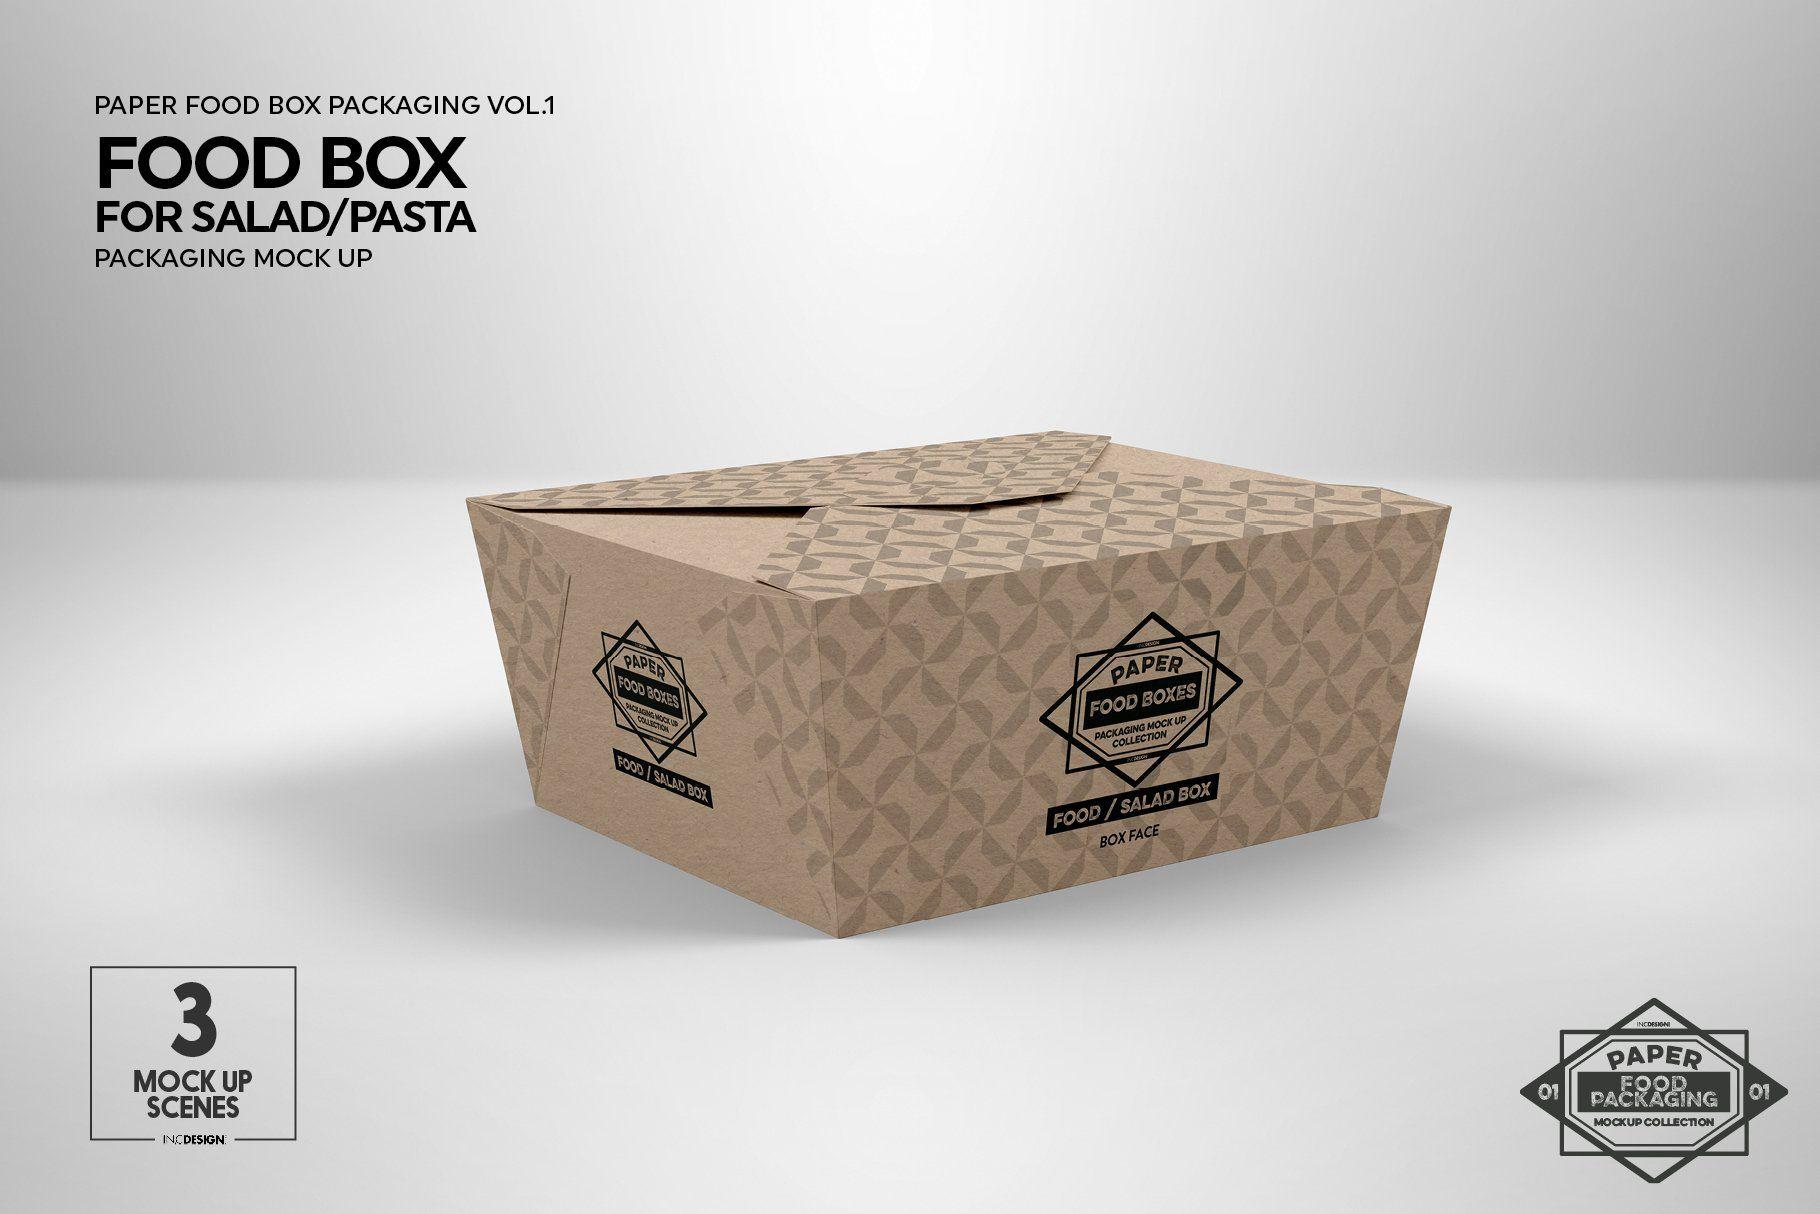 Download Vol 1 Paper Box Packaging Mockups Food Box Packaging Packaging Mockup Box Packaging